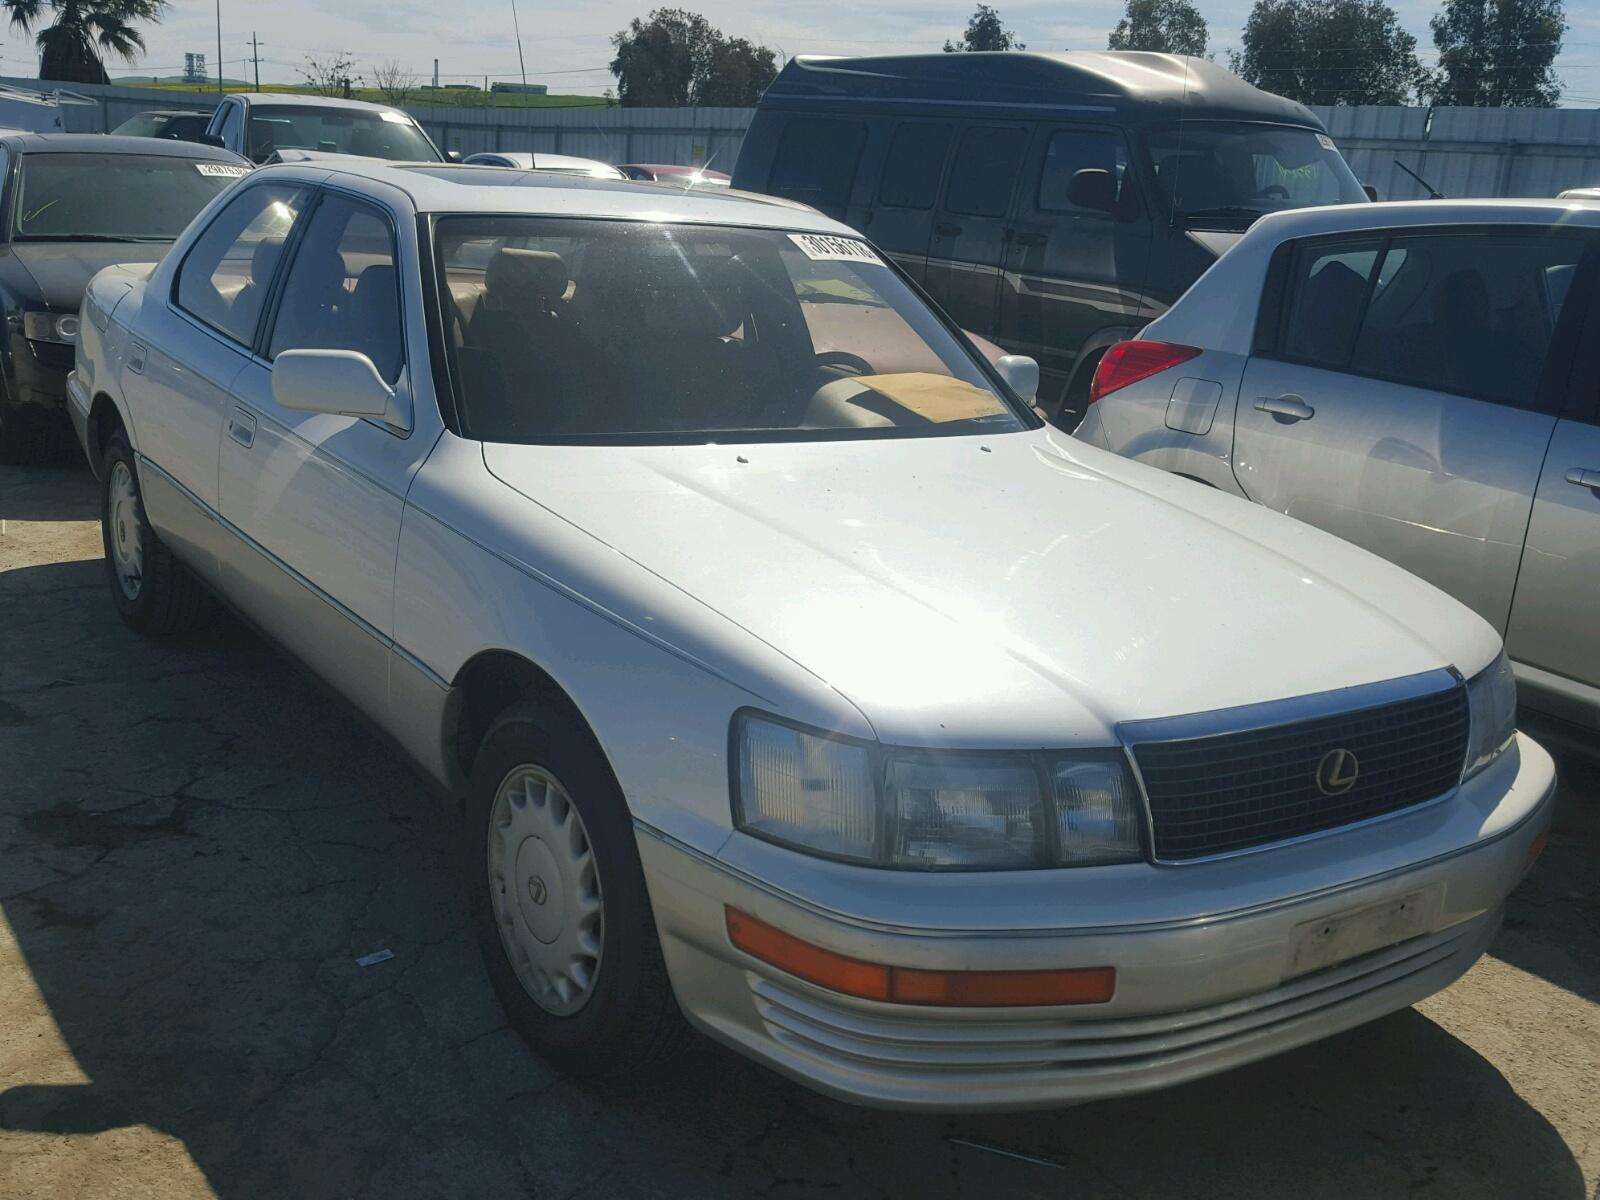 Salvage 1992 Lexus LS 400 for sale